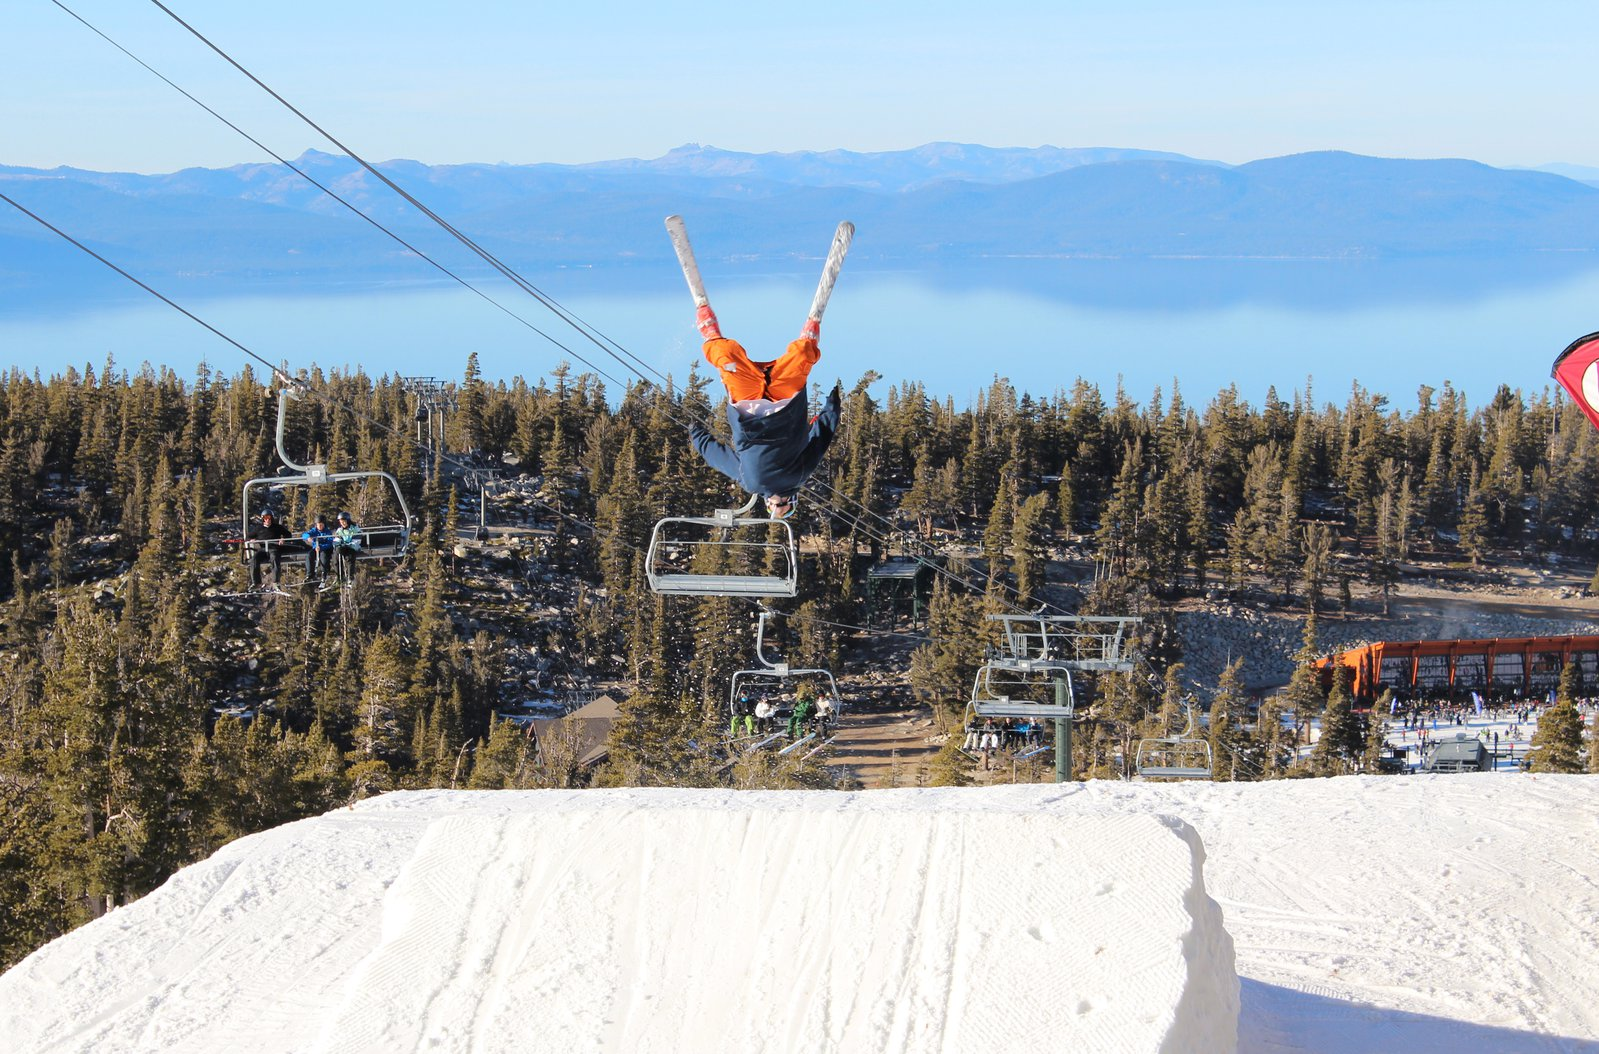 Backflip in Tahoe